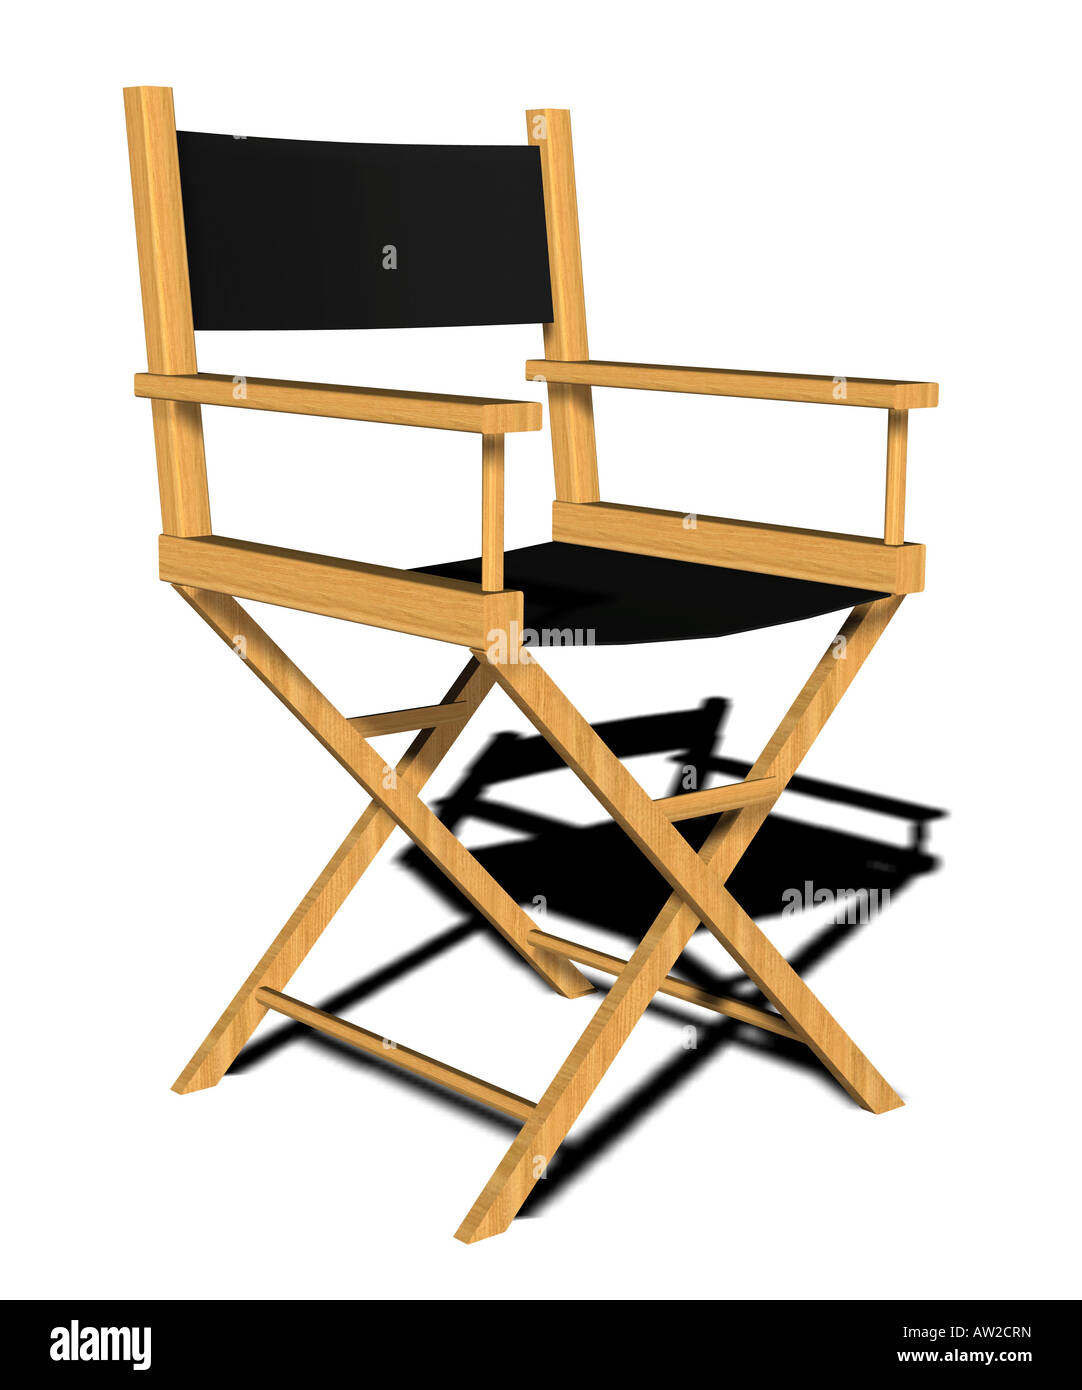 directors chair - Stock Image